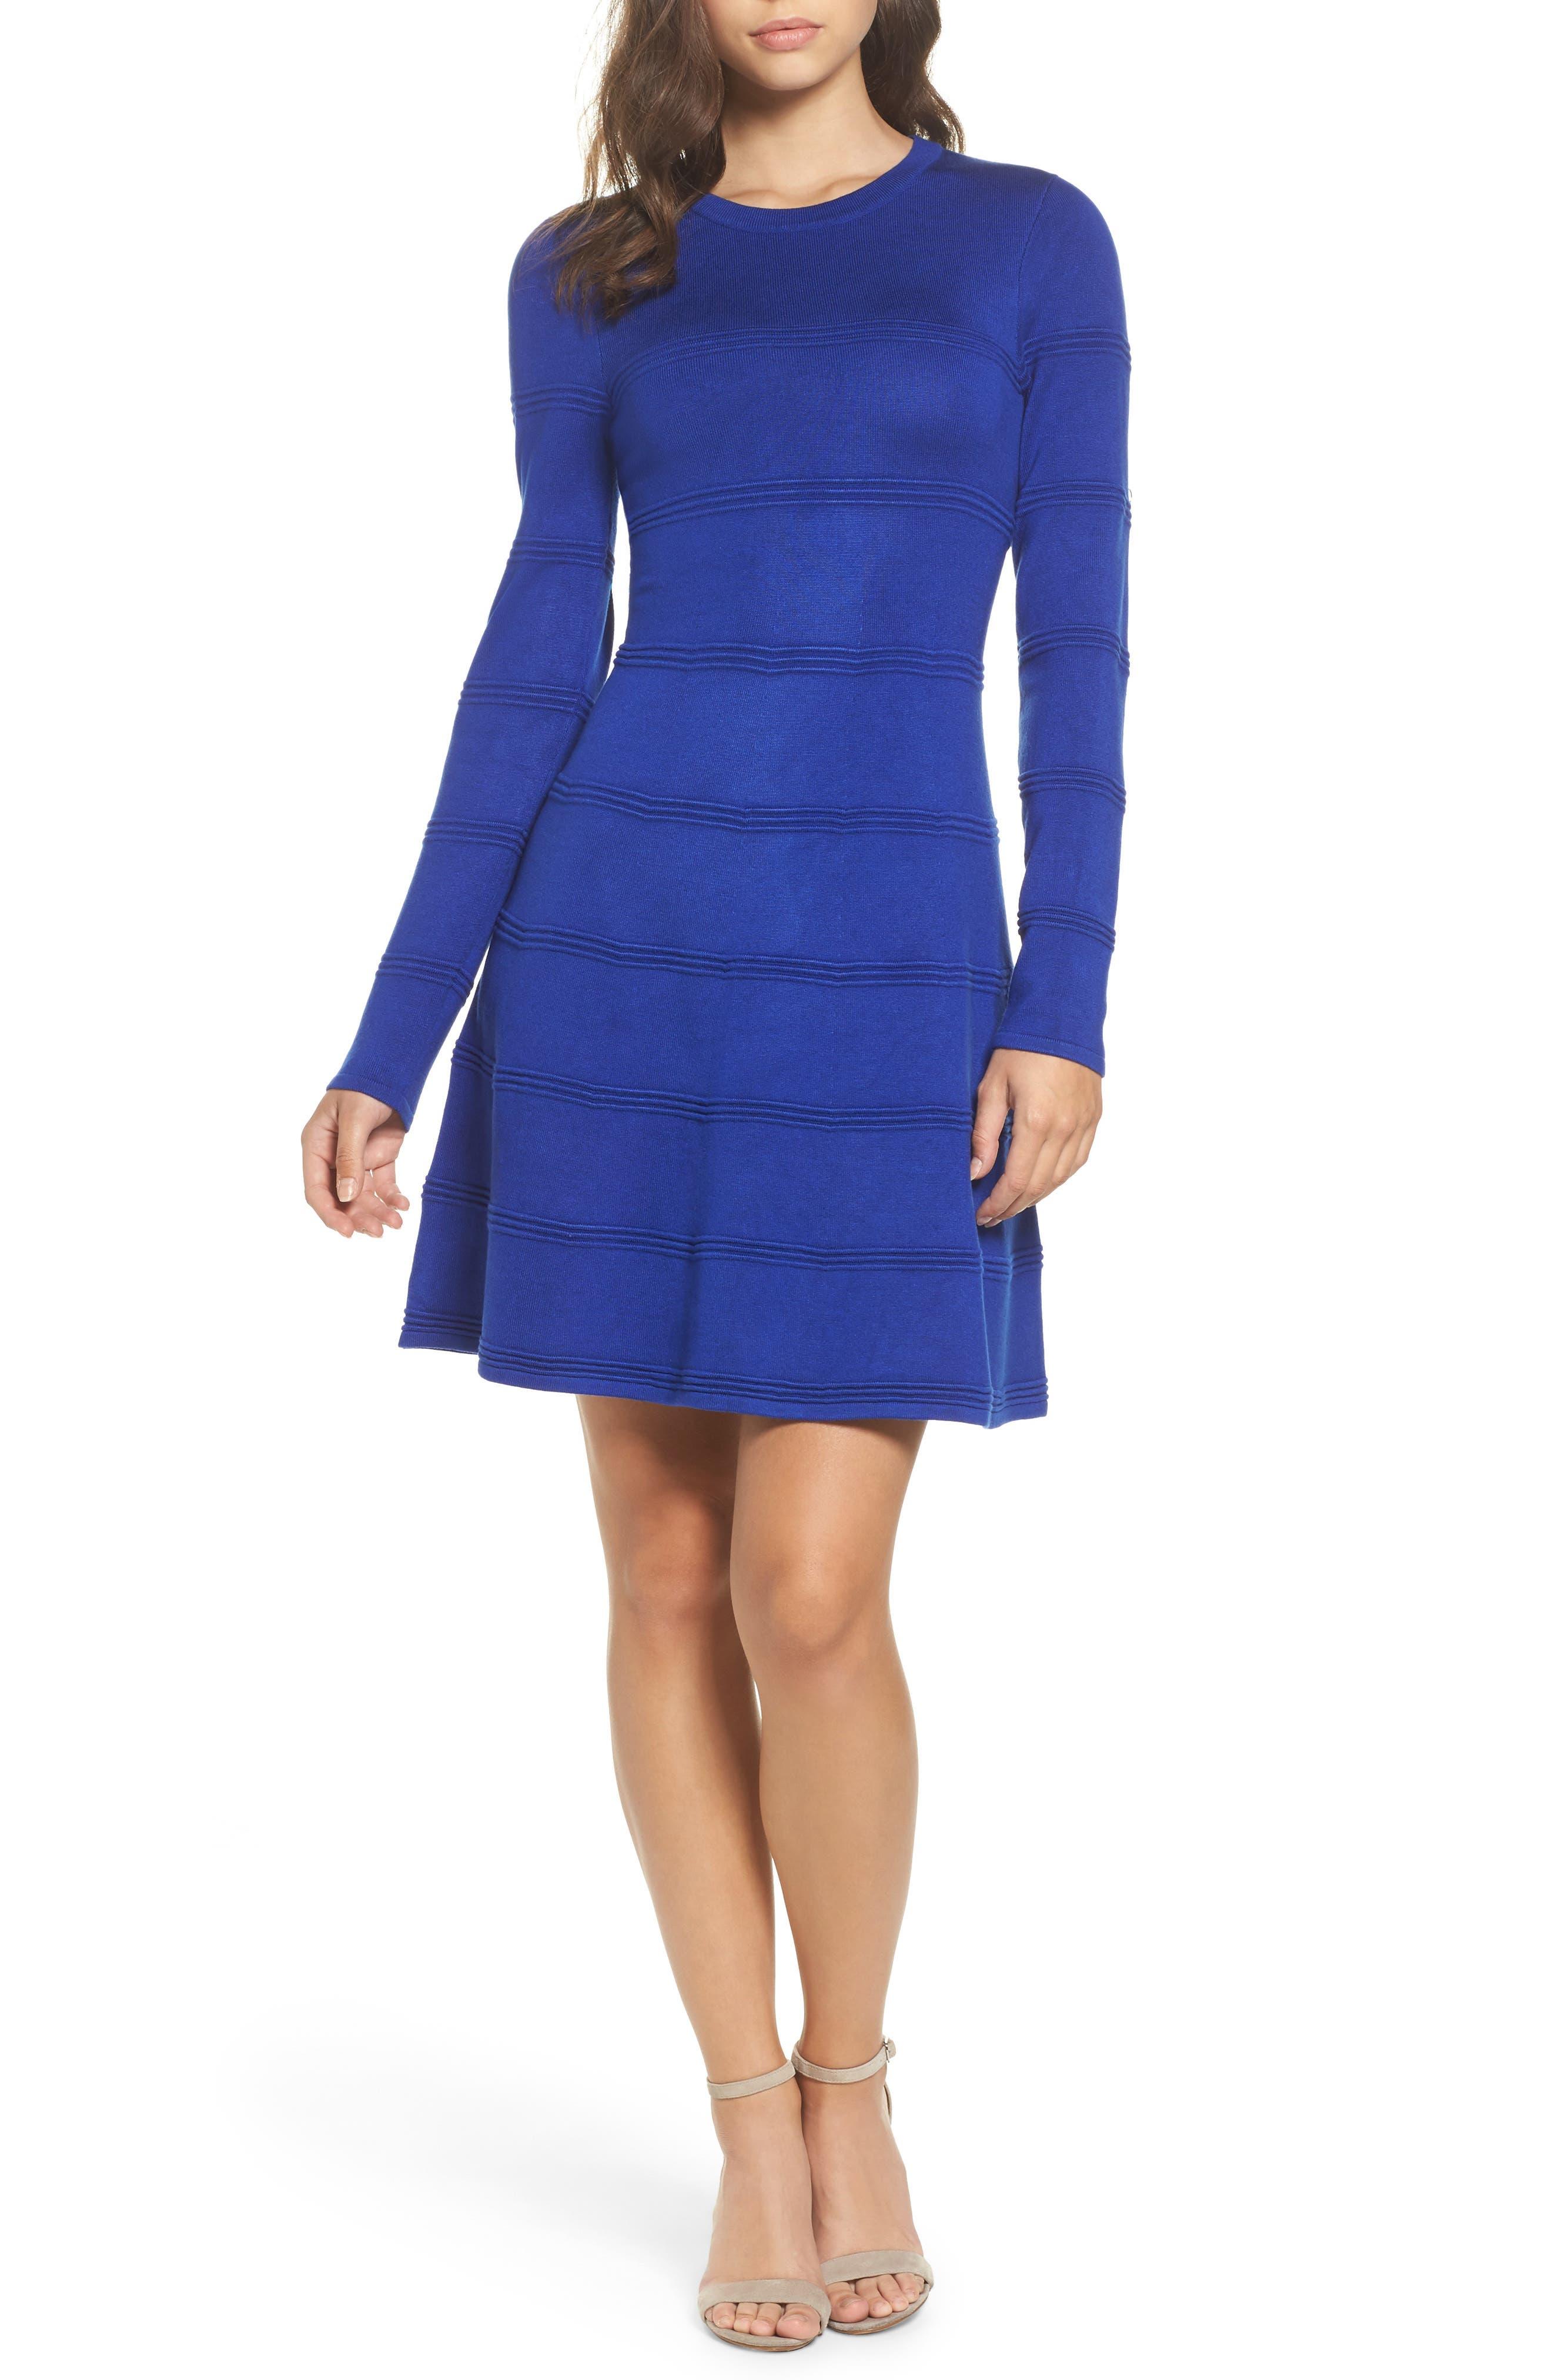 Alternate Image 1 Selected - Eliza J A-Line Sweater Dress